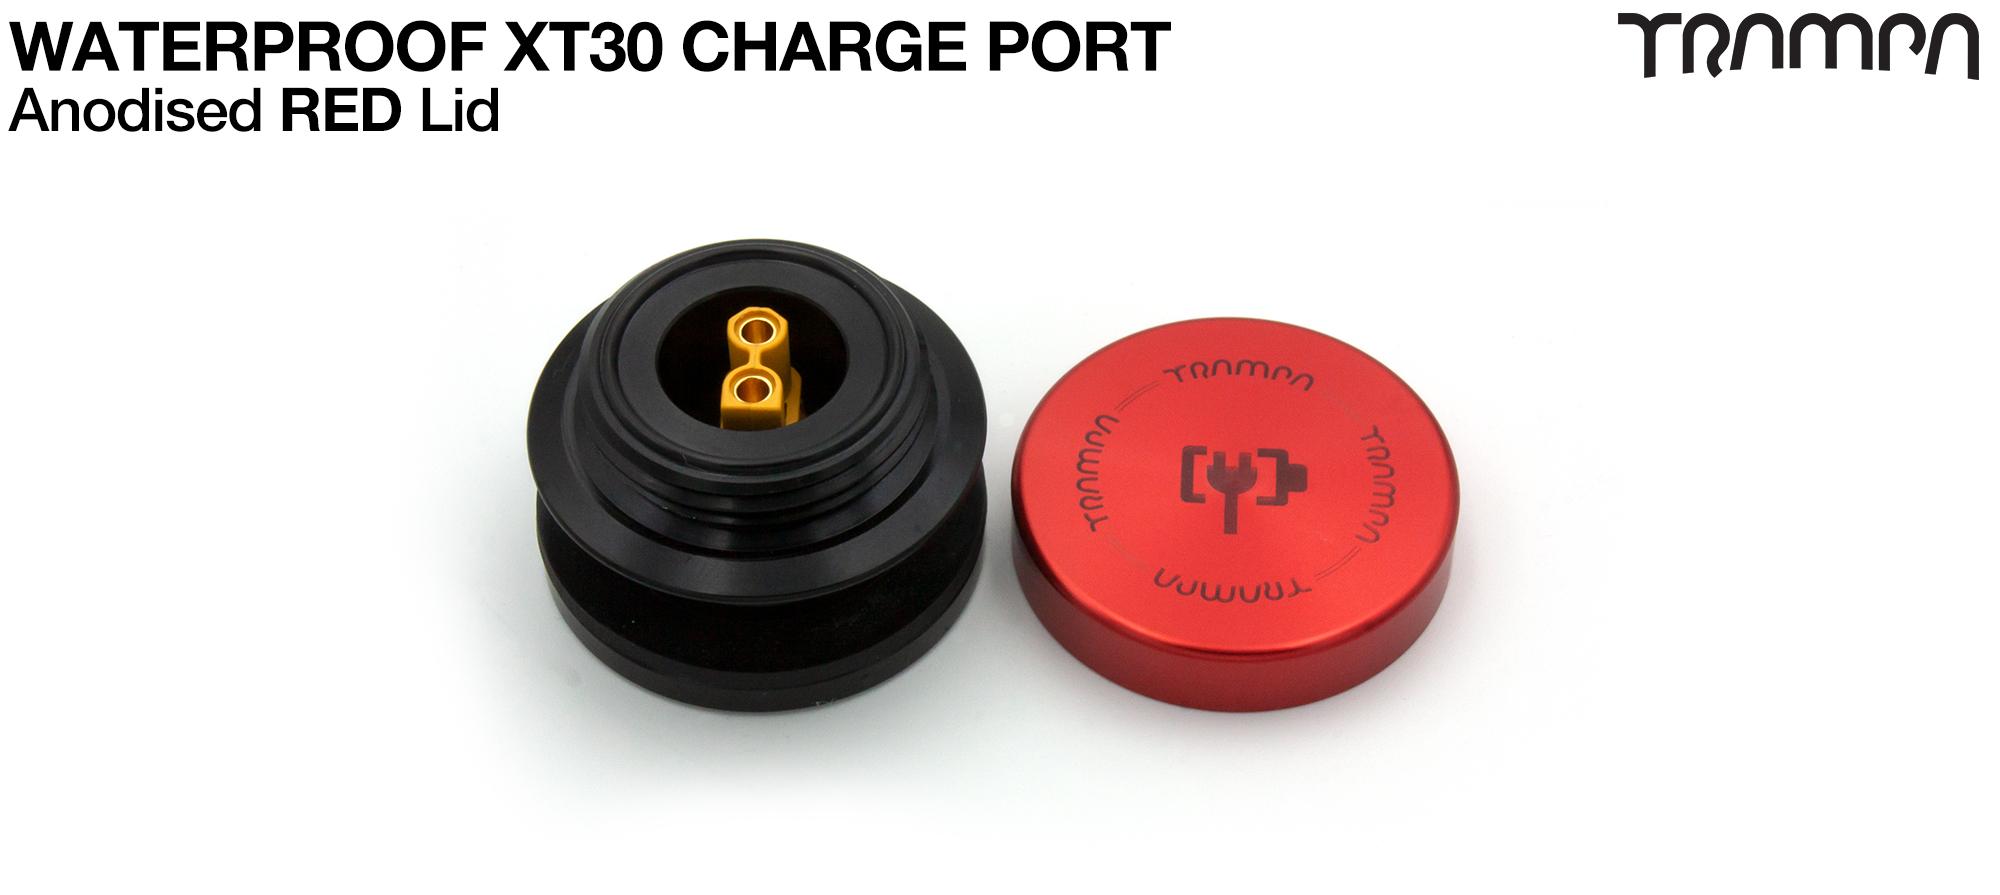 ORRSOM GT XT30 WATERPROOF Charge Port - RED